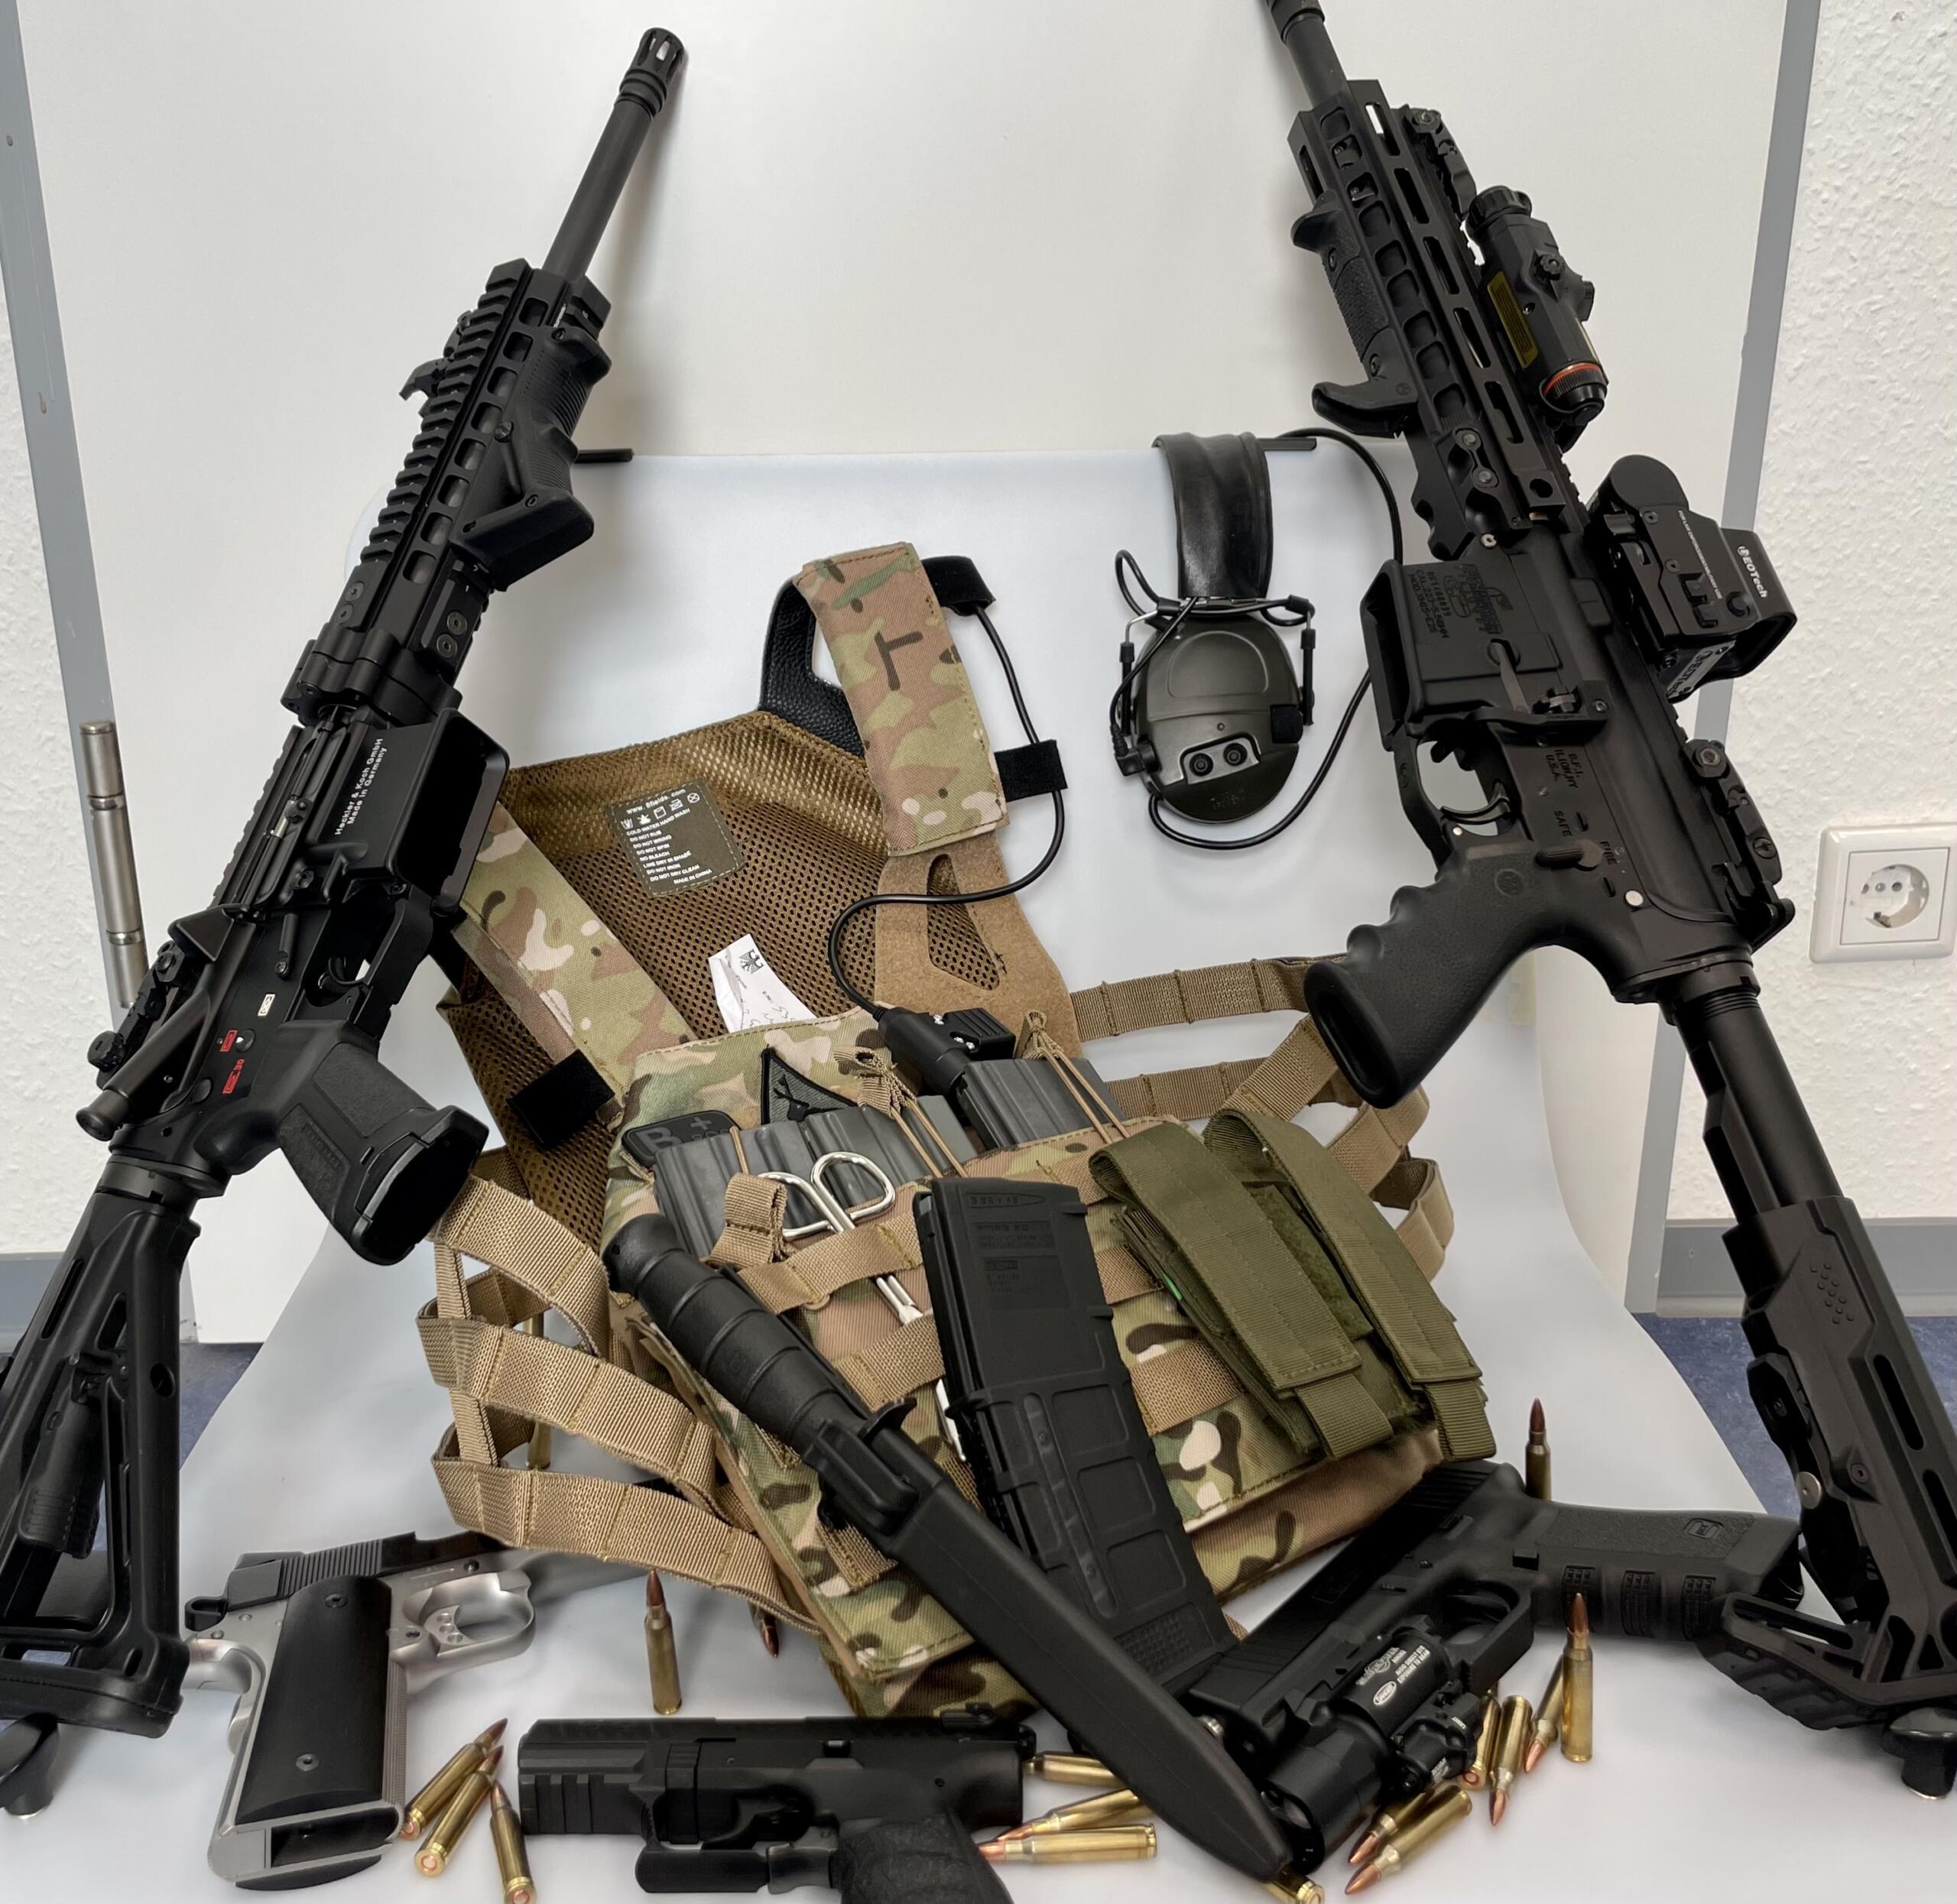 Savaş silahları ele geçirildi